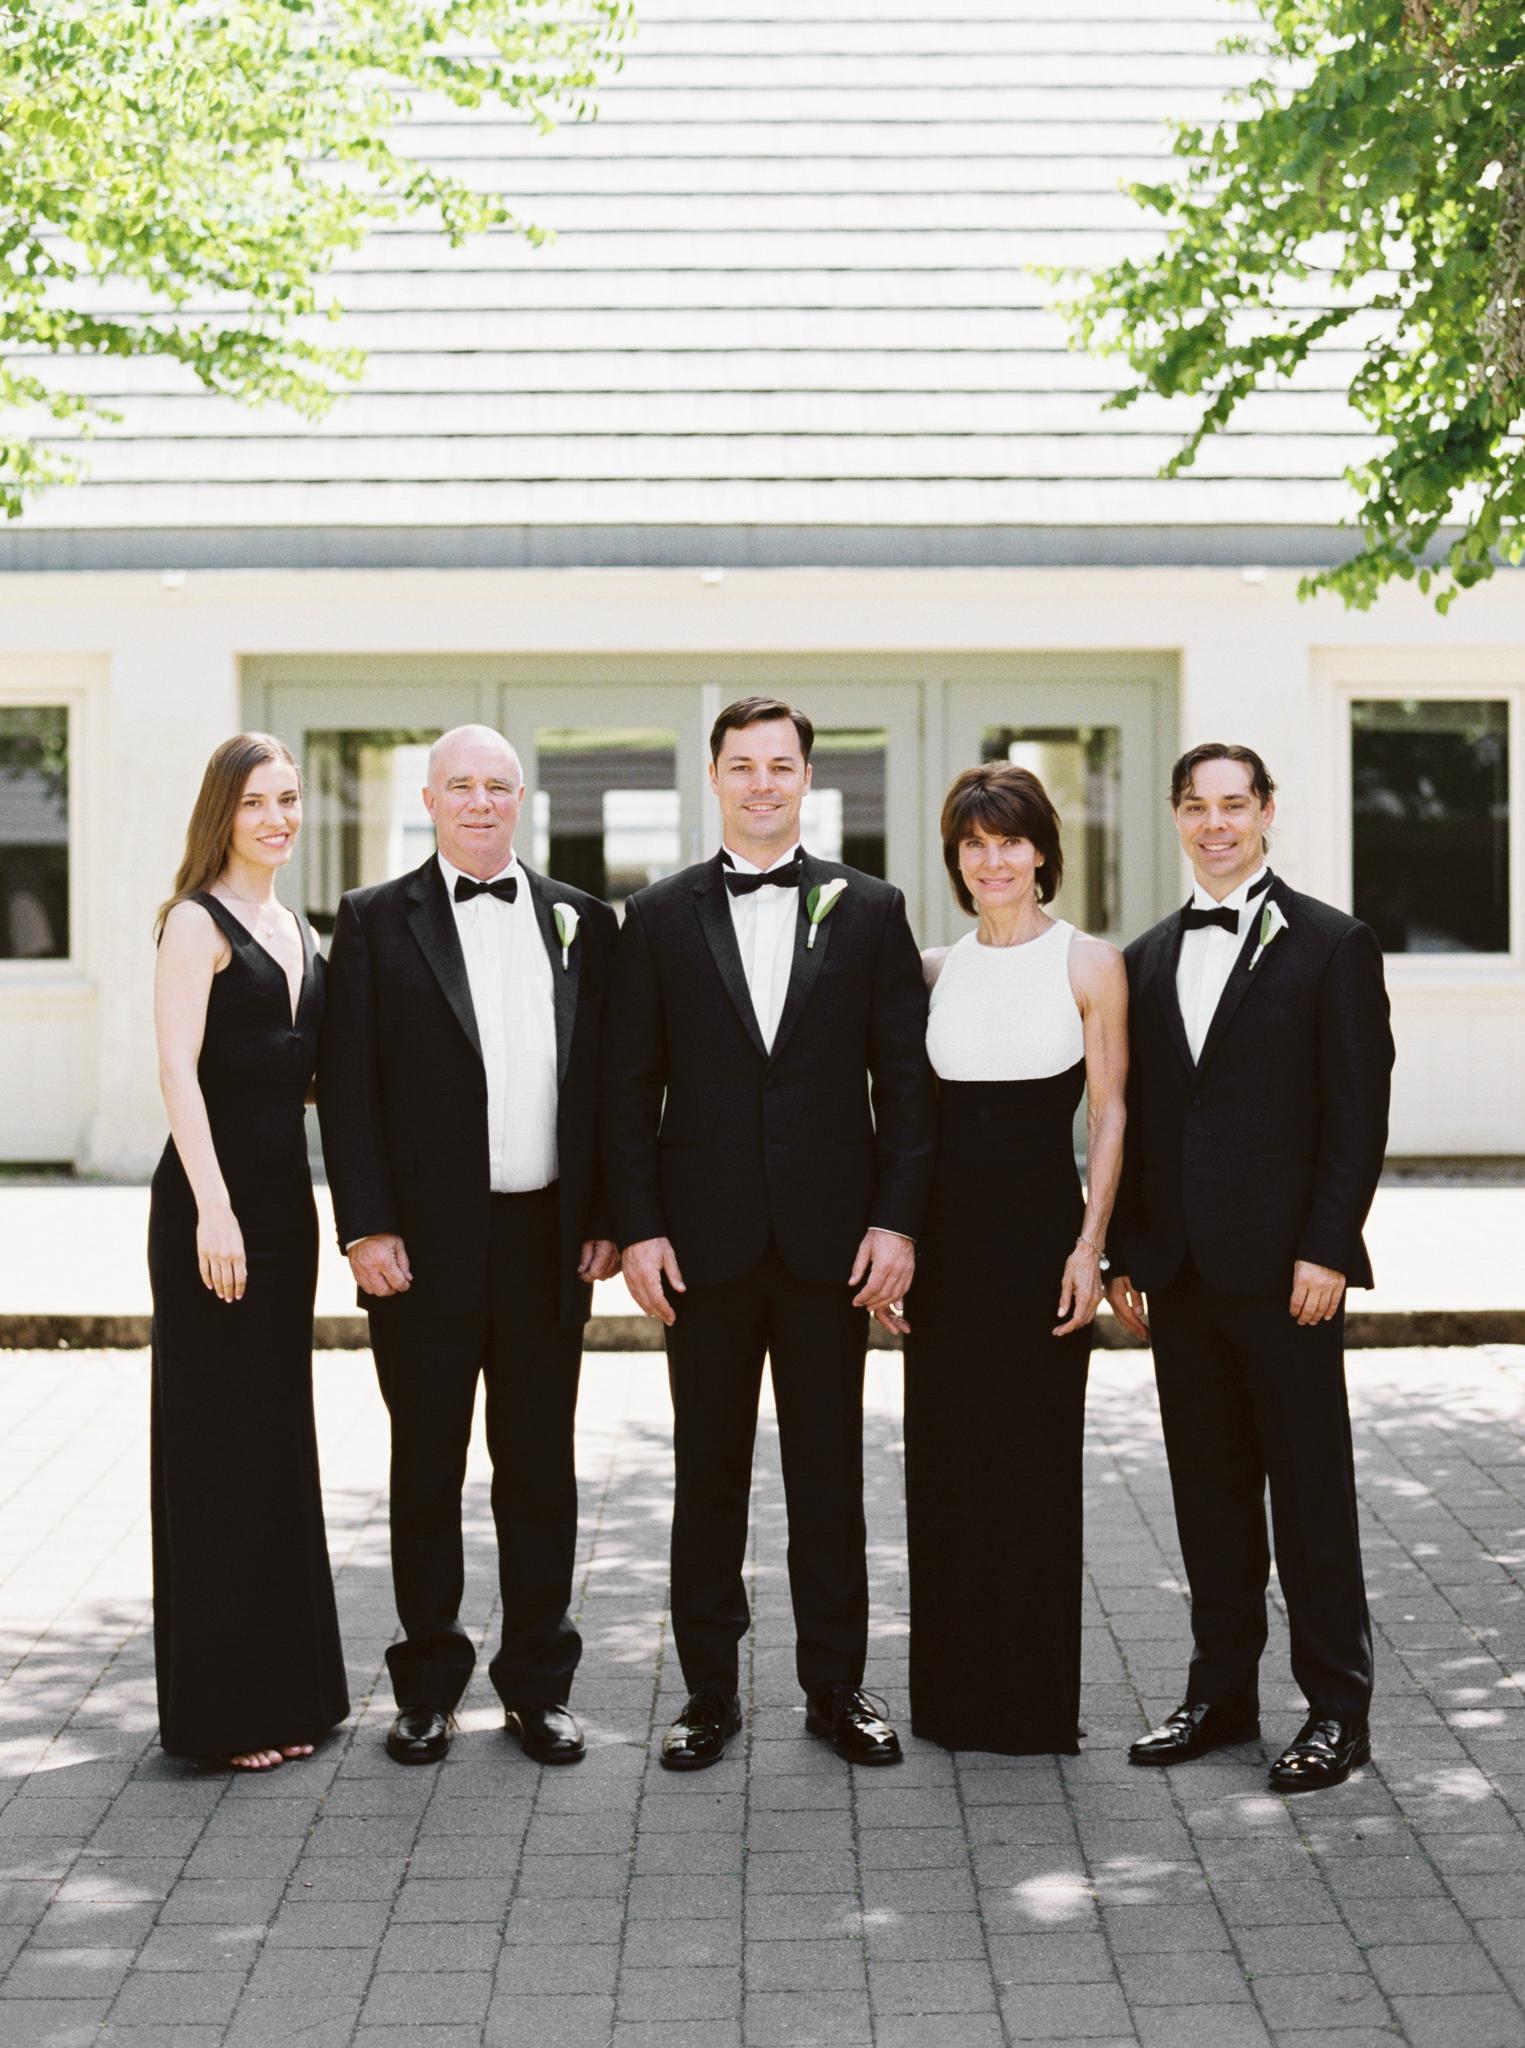 070OutliveCreative_Travel_Photographer_Videographer_Lewis&Clark_Oregon_Elegant_BlackTie_Destination_Wedding.jpg